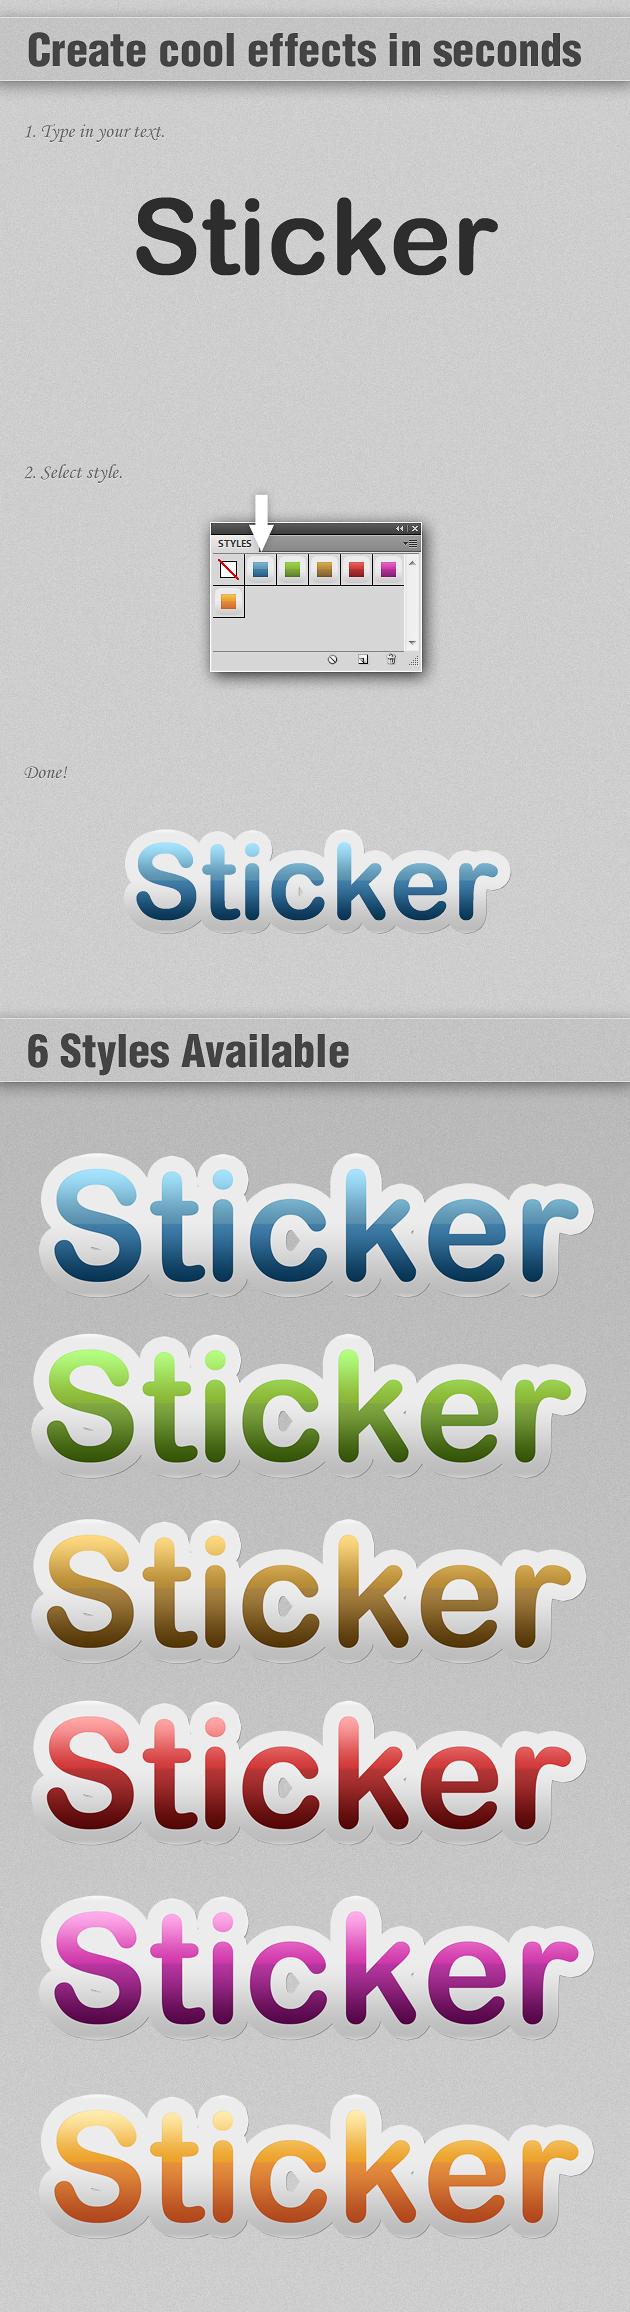 sticker-photoshop-text-styles